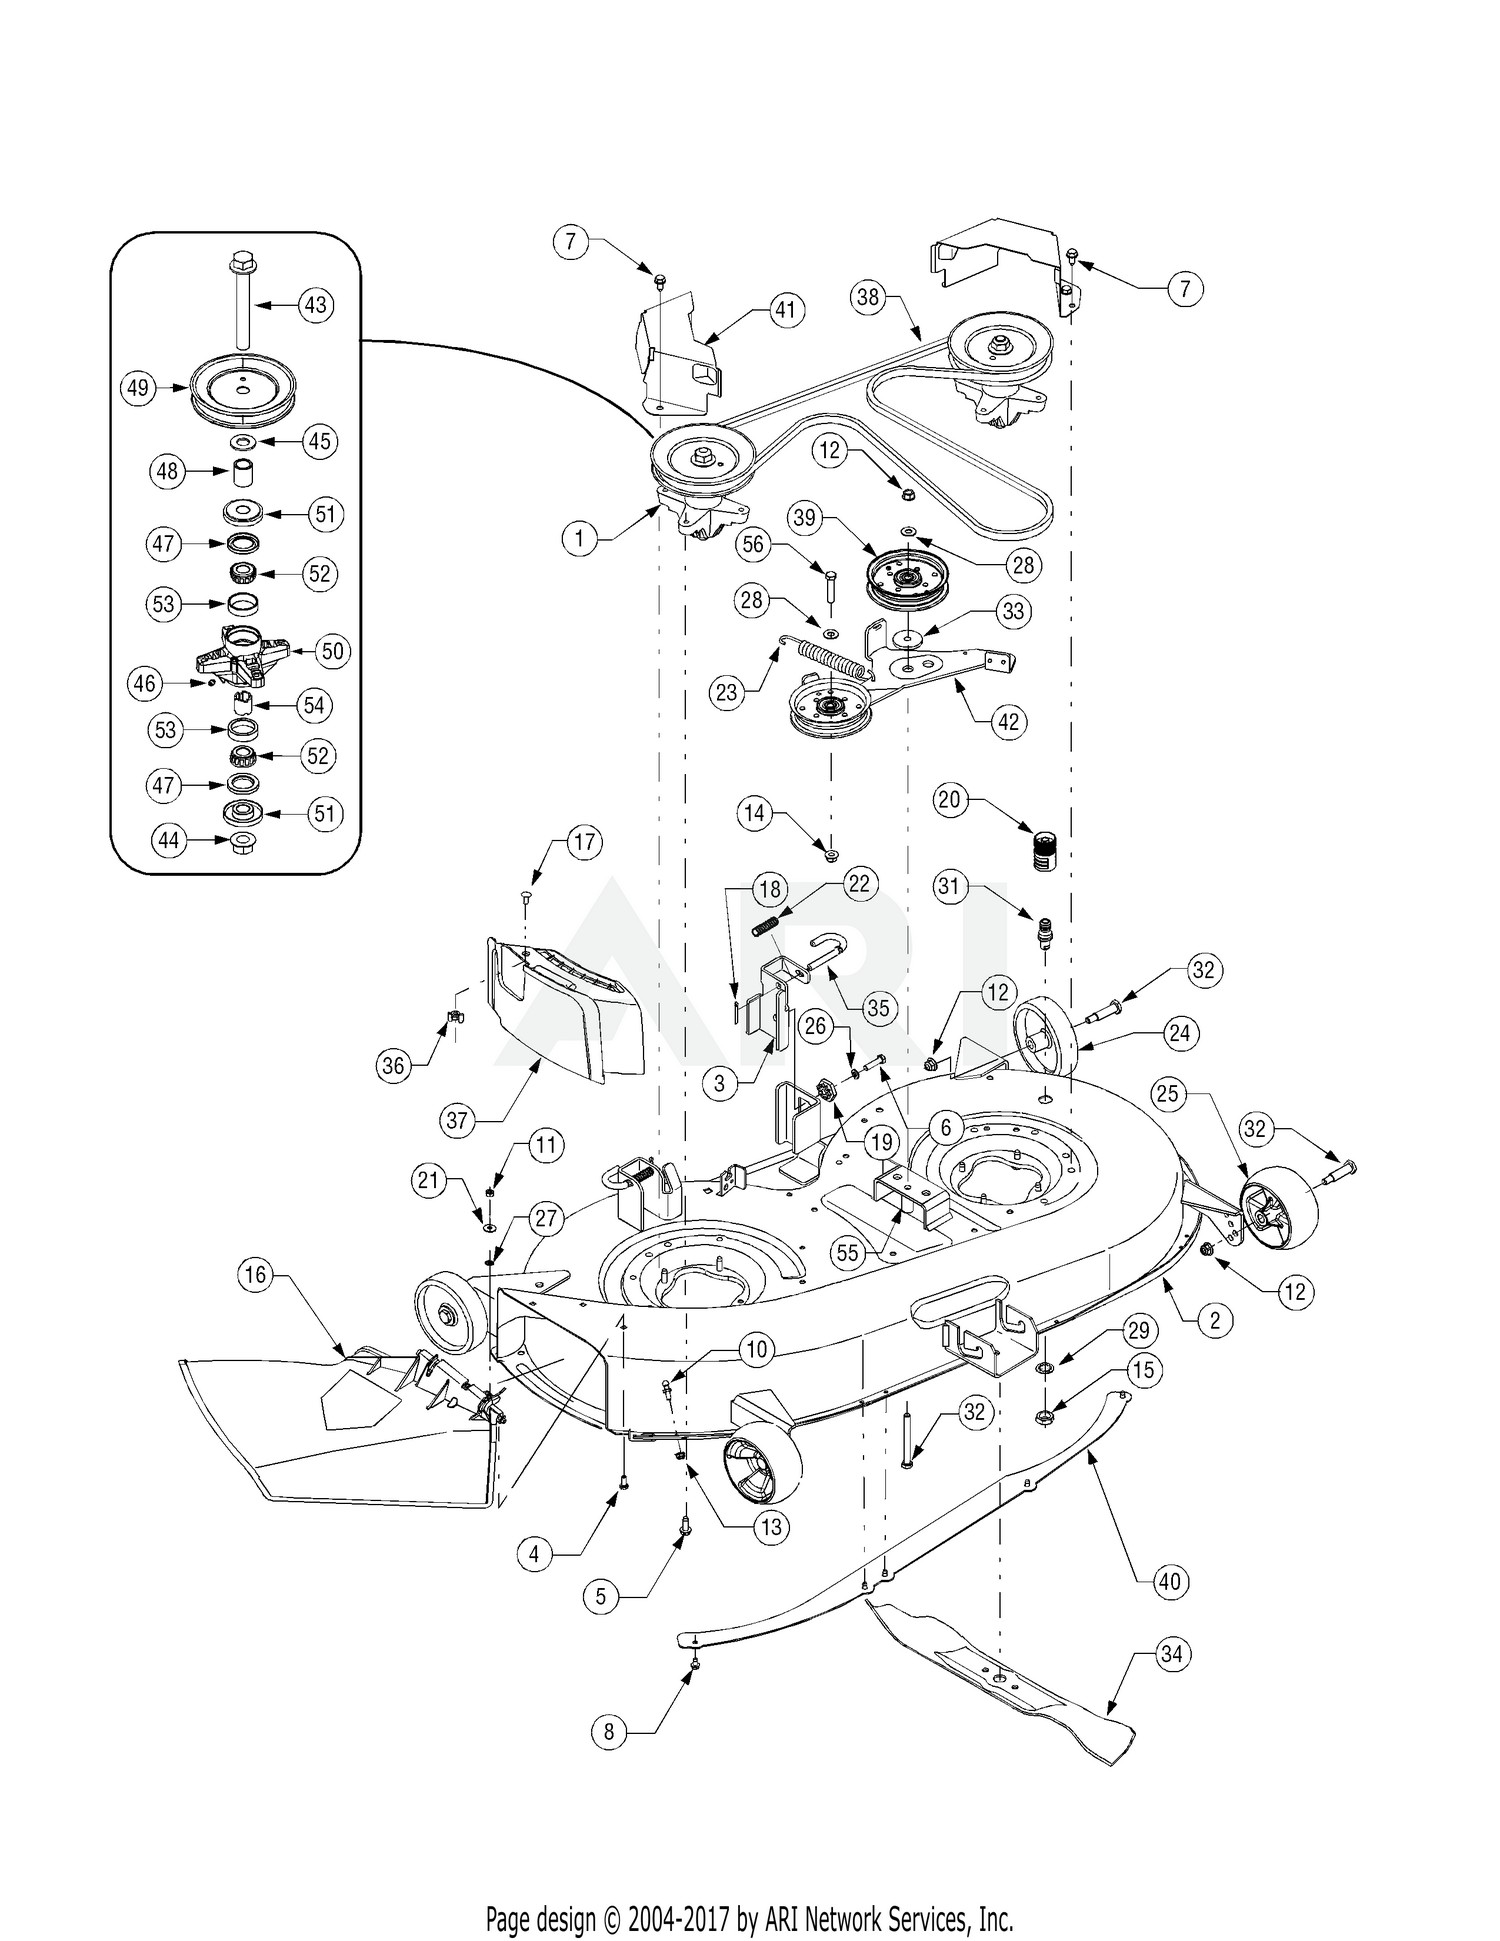 hight resolution of cub cadet lt1042 parts diagram my wiring diagram cub cadet mower deck diagram cub cadet ltx 1042 mower deck